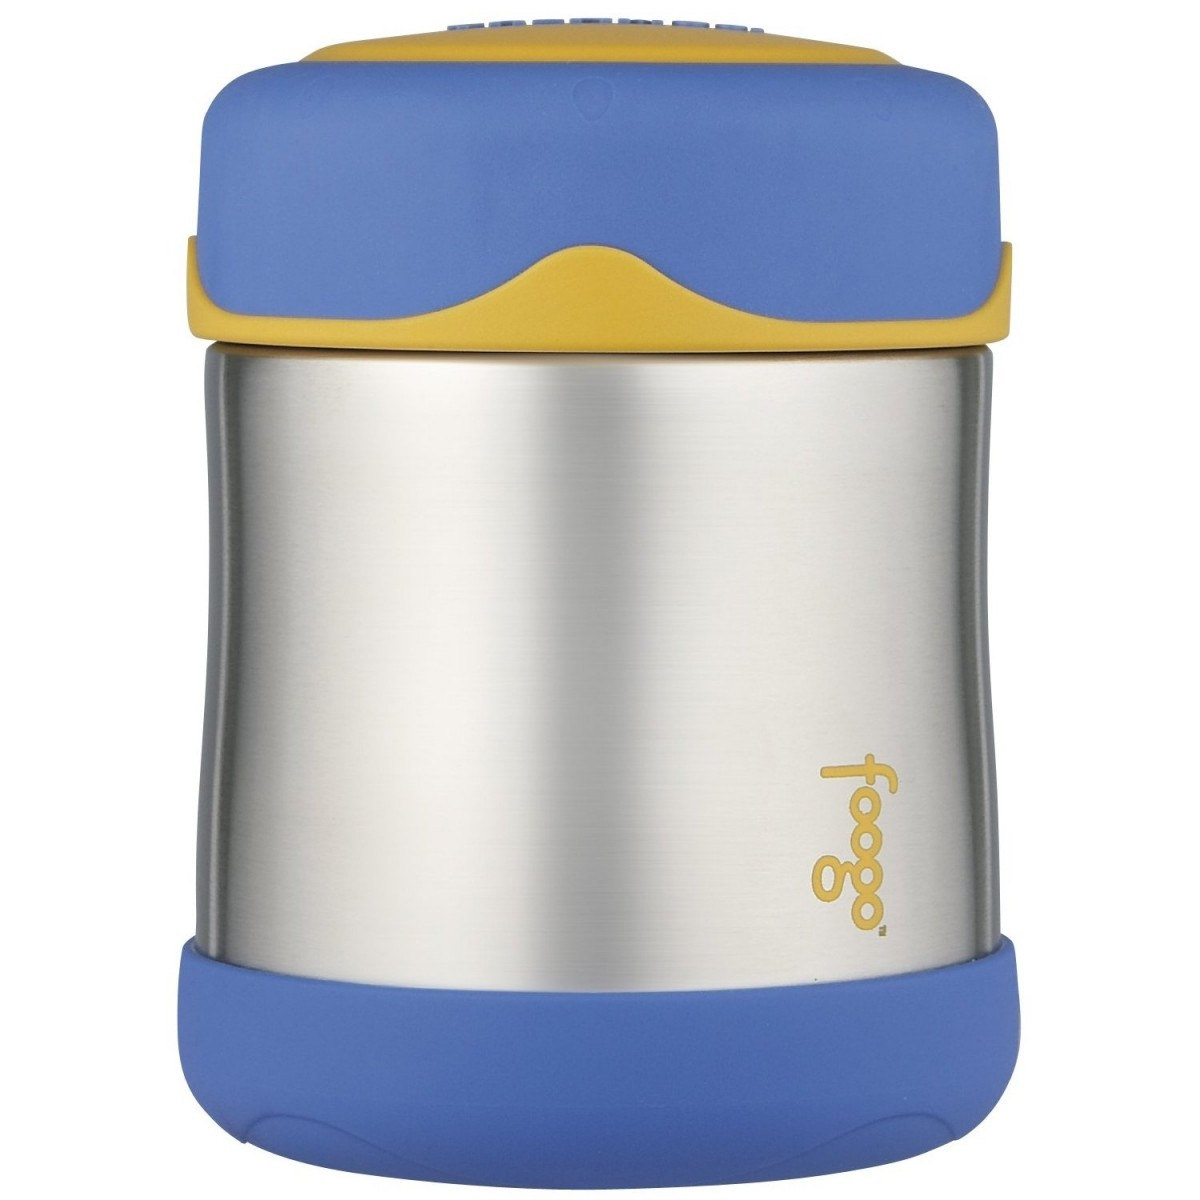 Pote Térmico Foogo 290 ml Azul e Amarelo Thermos